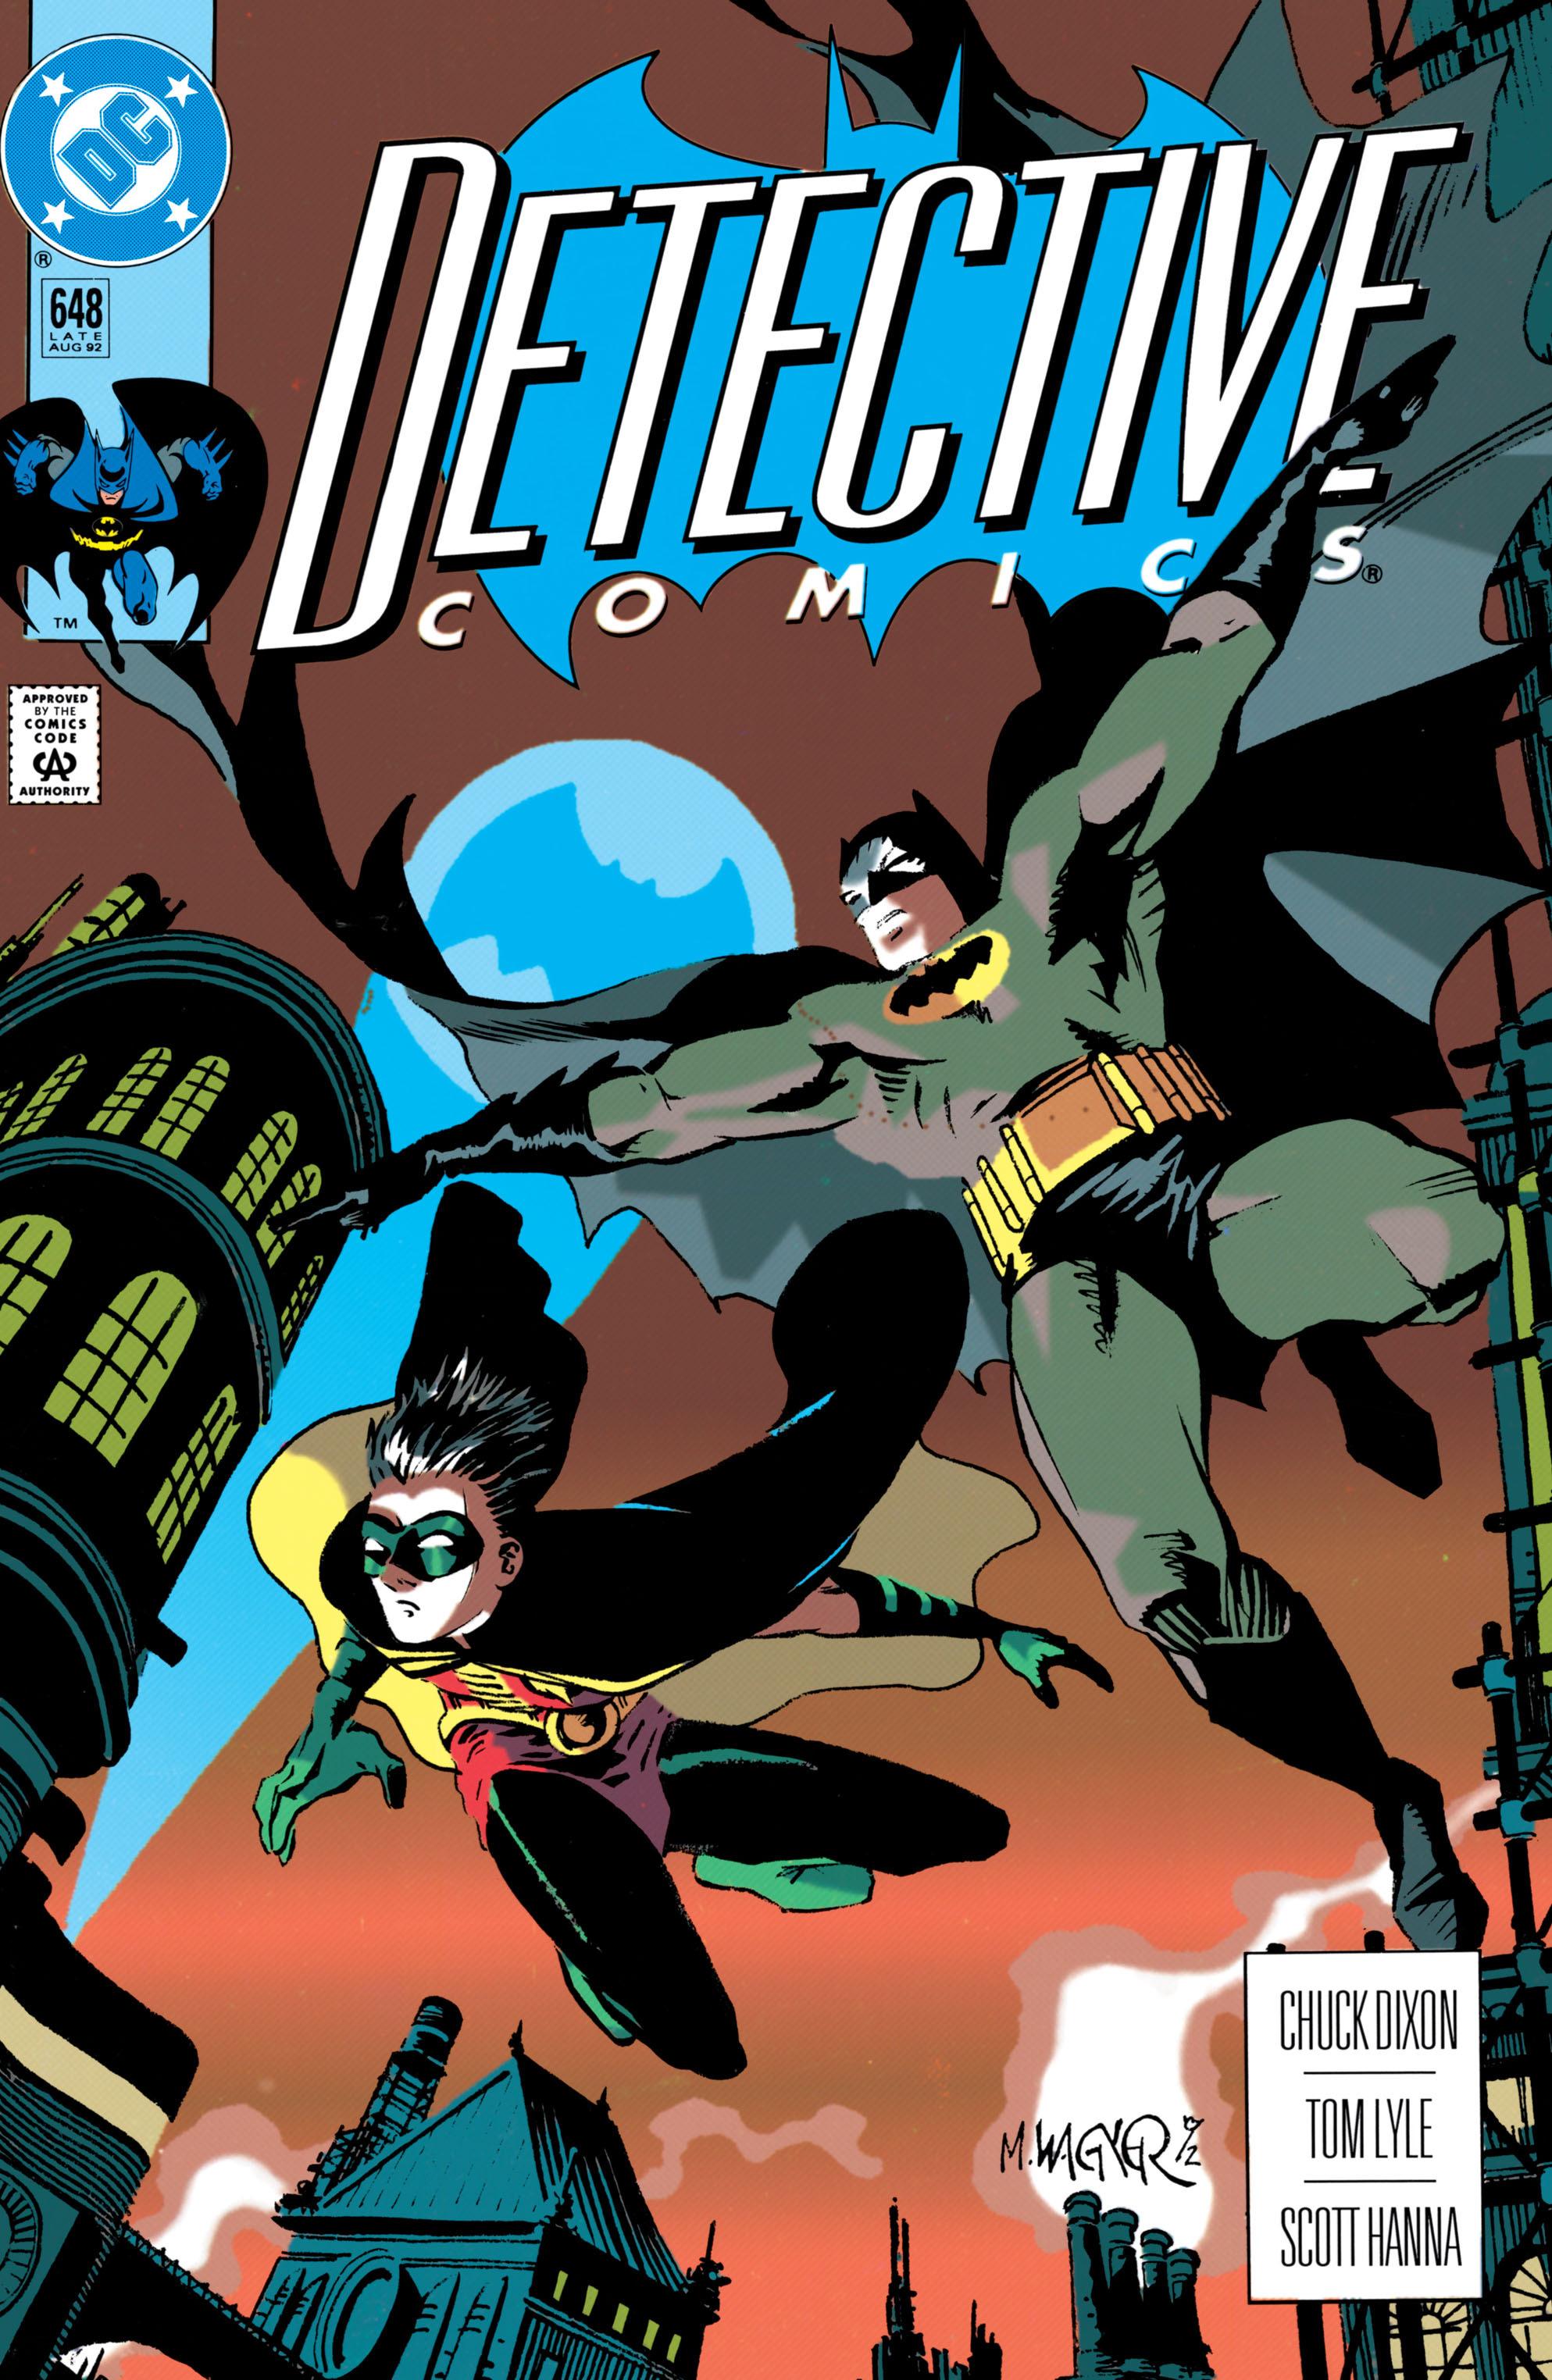 Detective Comics (1937) 648 Page 1